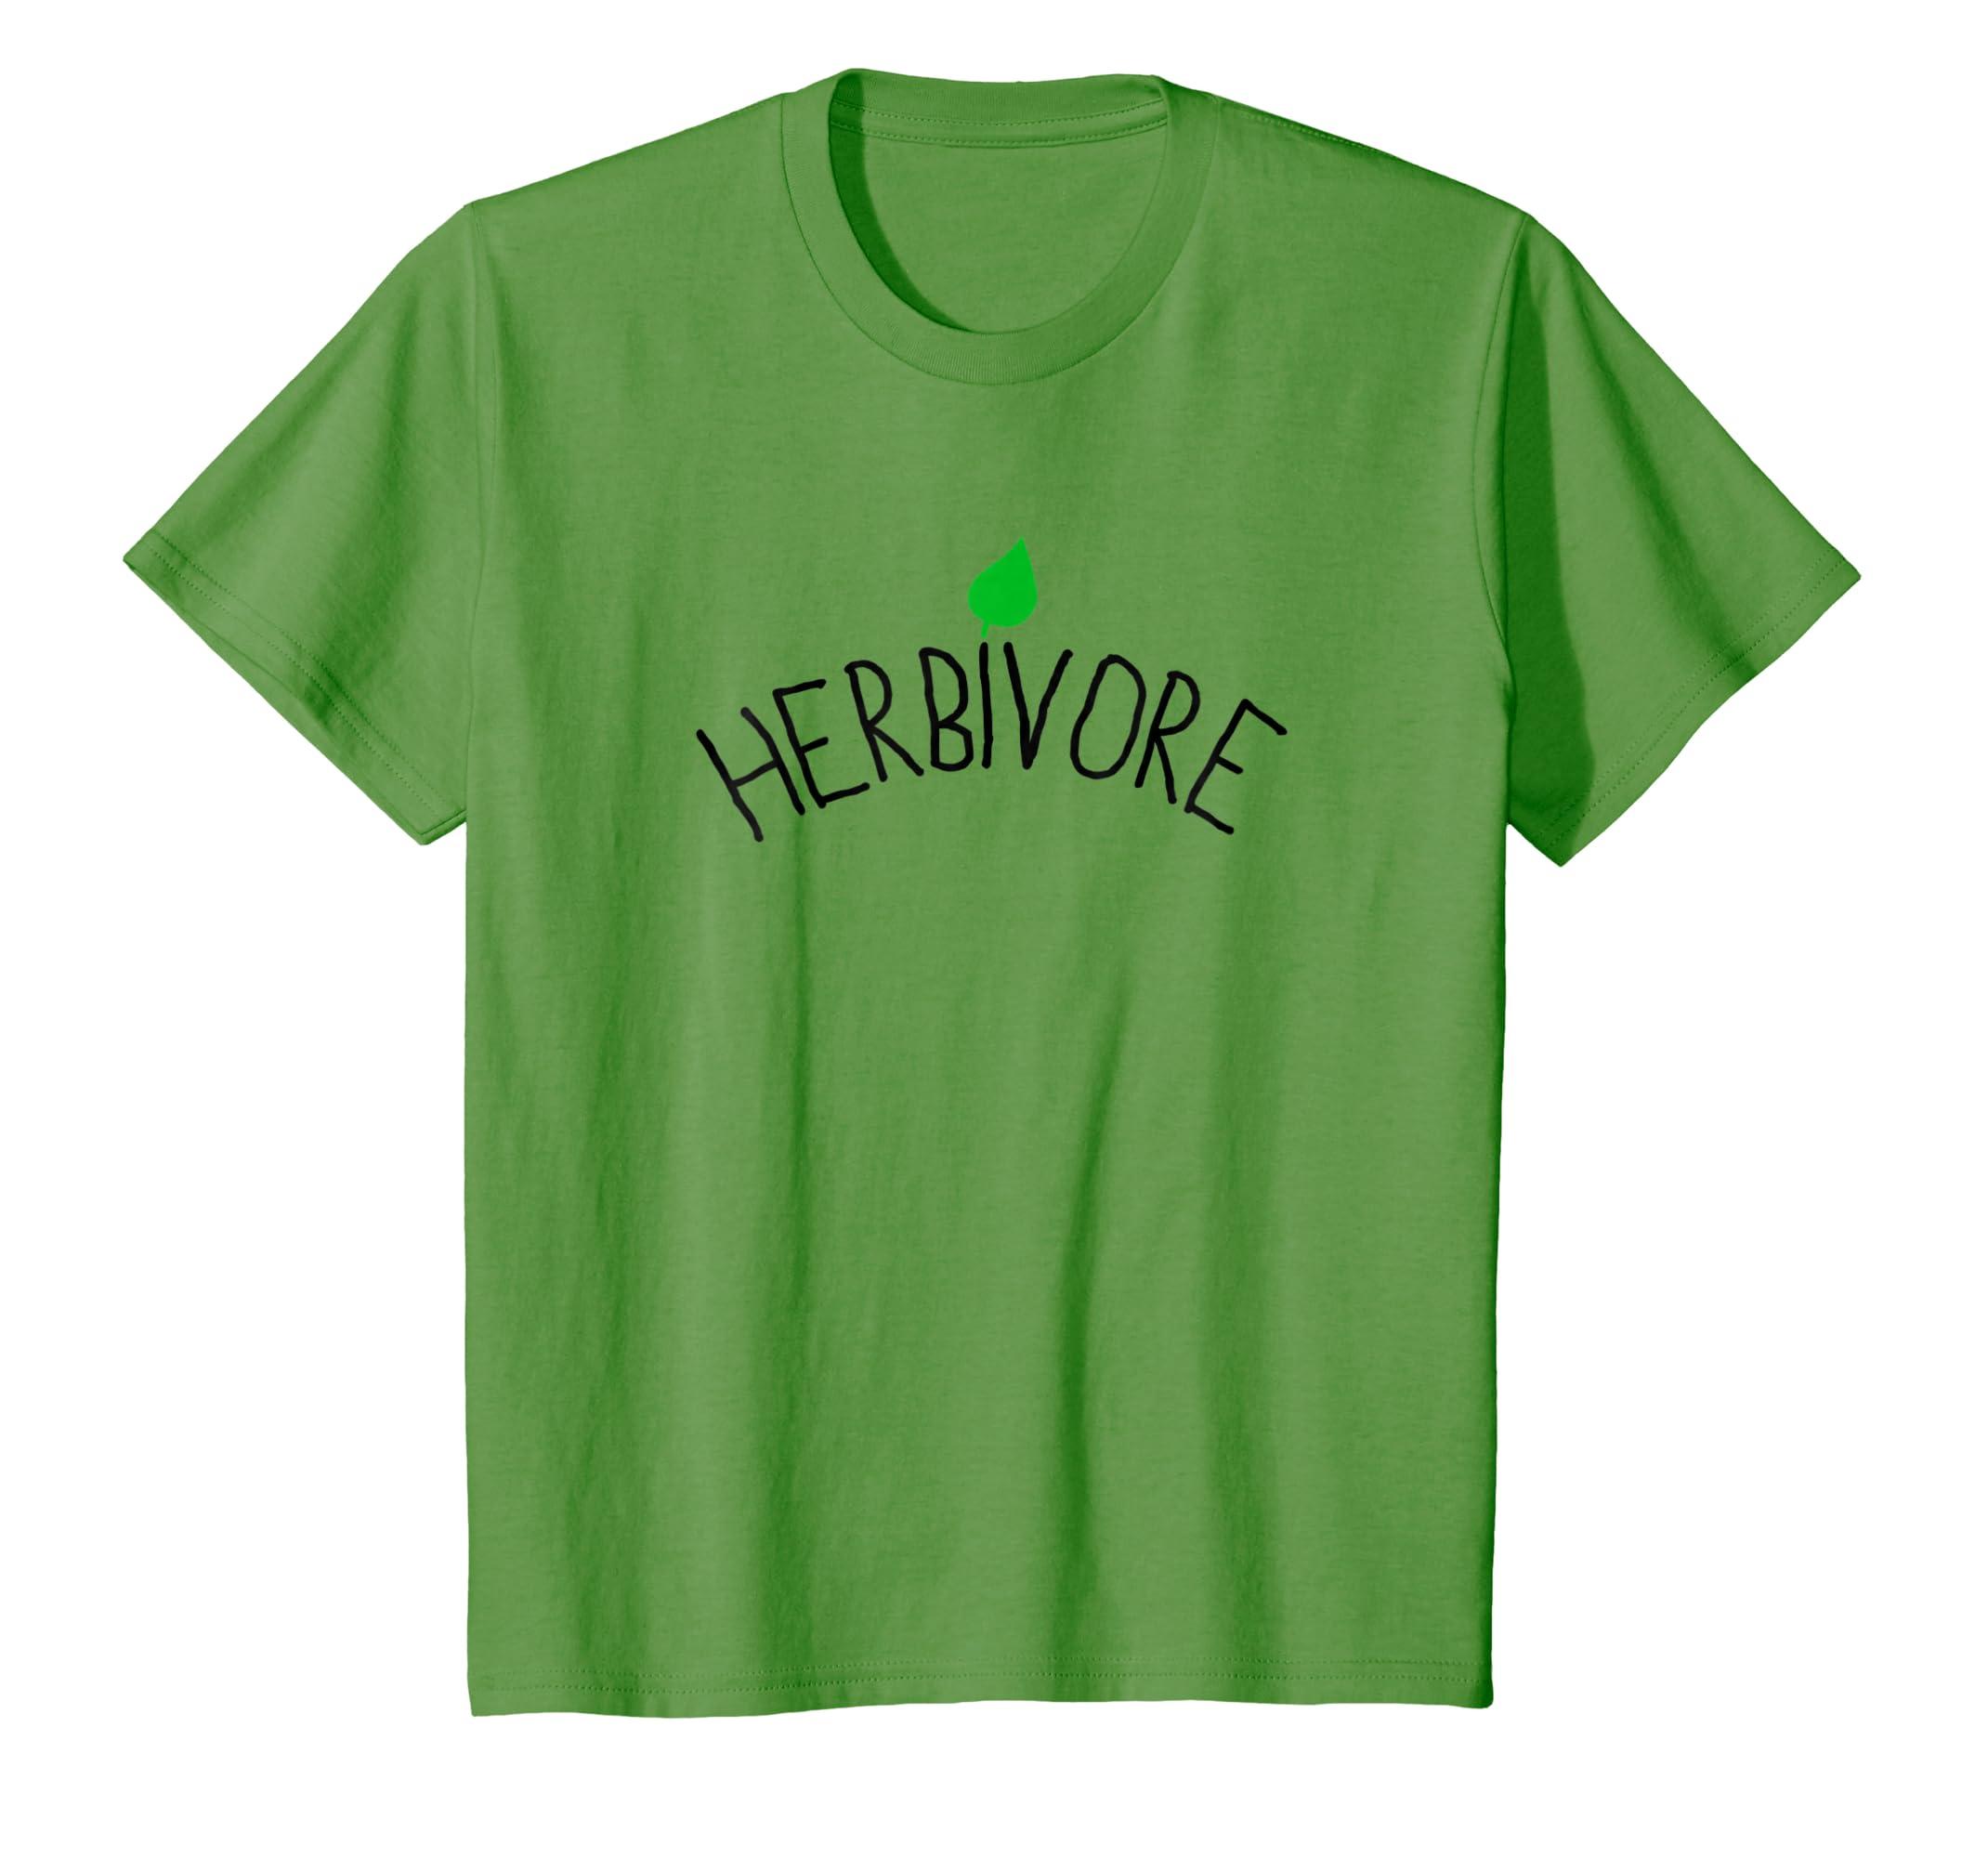 540d757e48 Amazon.com: Herbivore T-shirt - Funny Vegan Tshirt Vegan Shirts Vegan:  Clothing